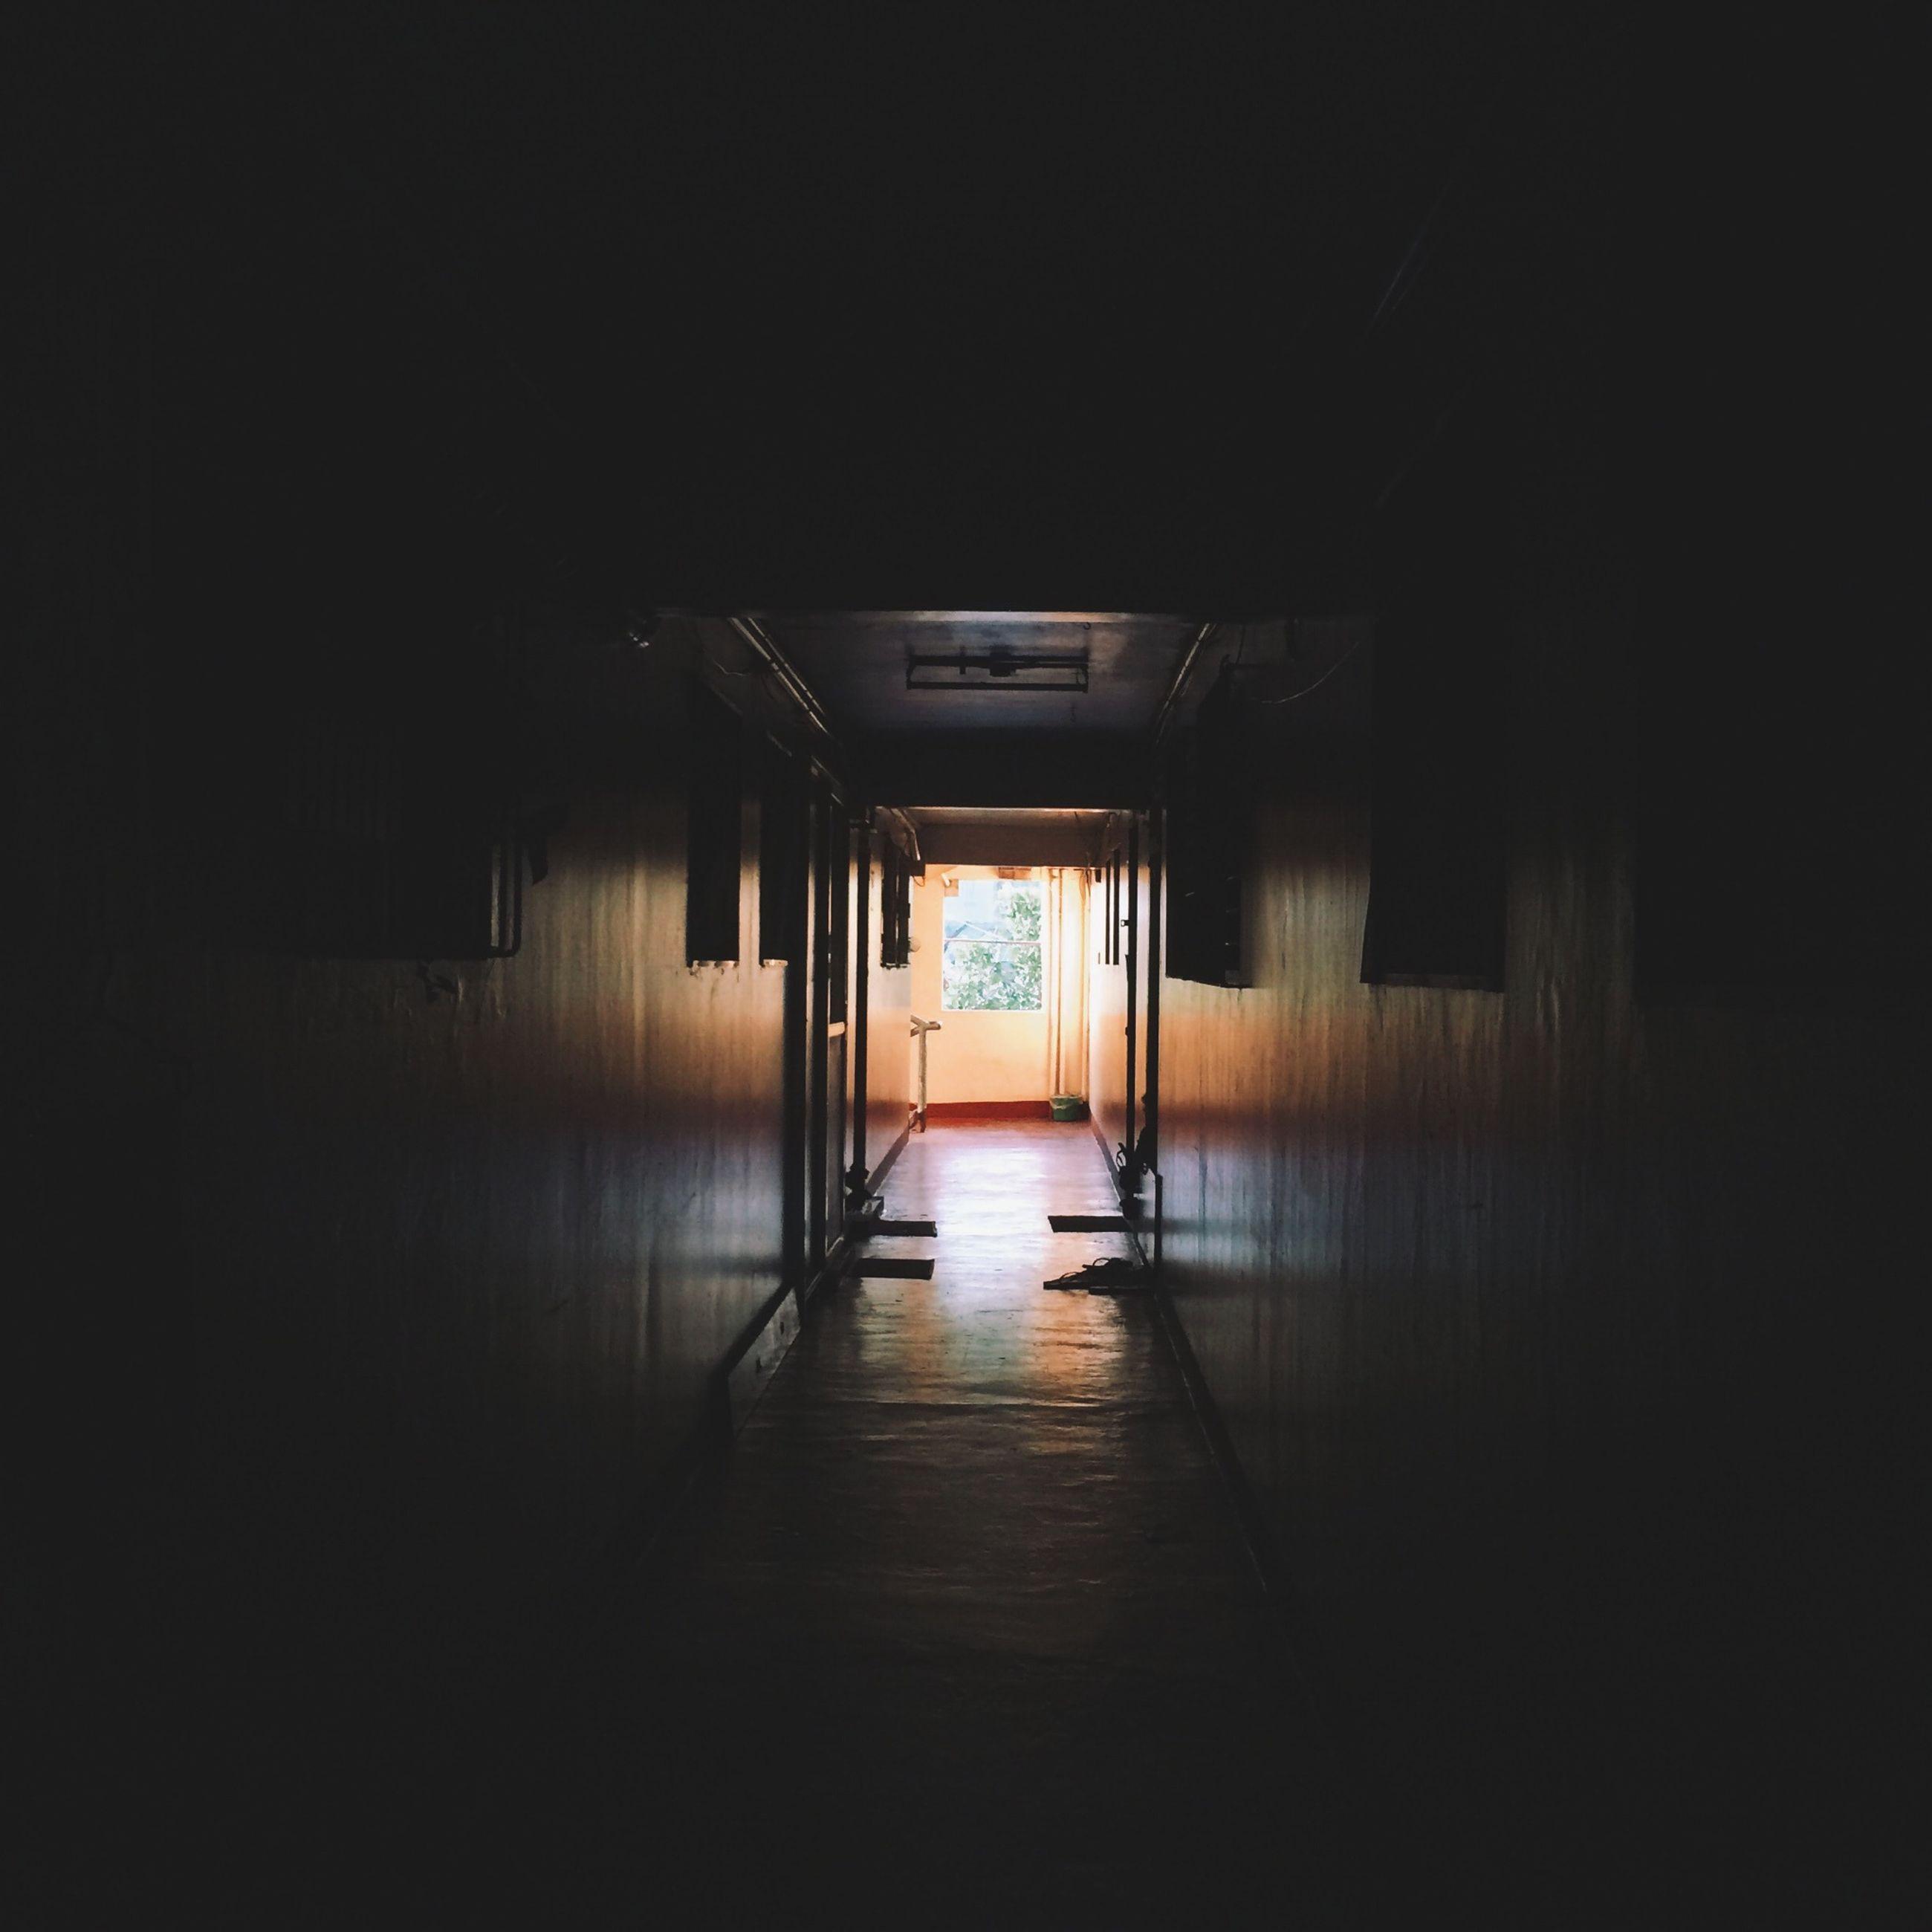 architecture, built structure, indoors, the way forward, corridor, door, illuminated, empty, narrow, dark, entrance, absence, doorway, house, flooring, long, diminishing perspective, building, walkway, no people